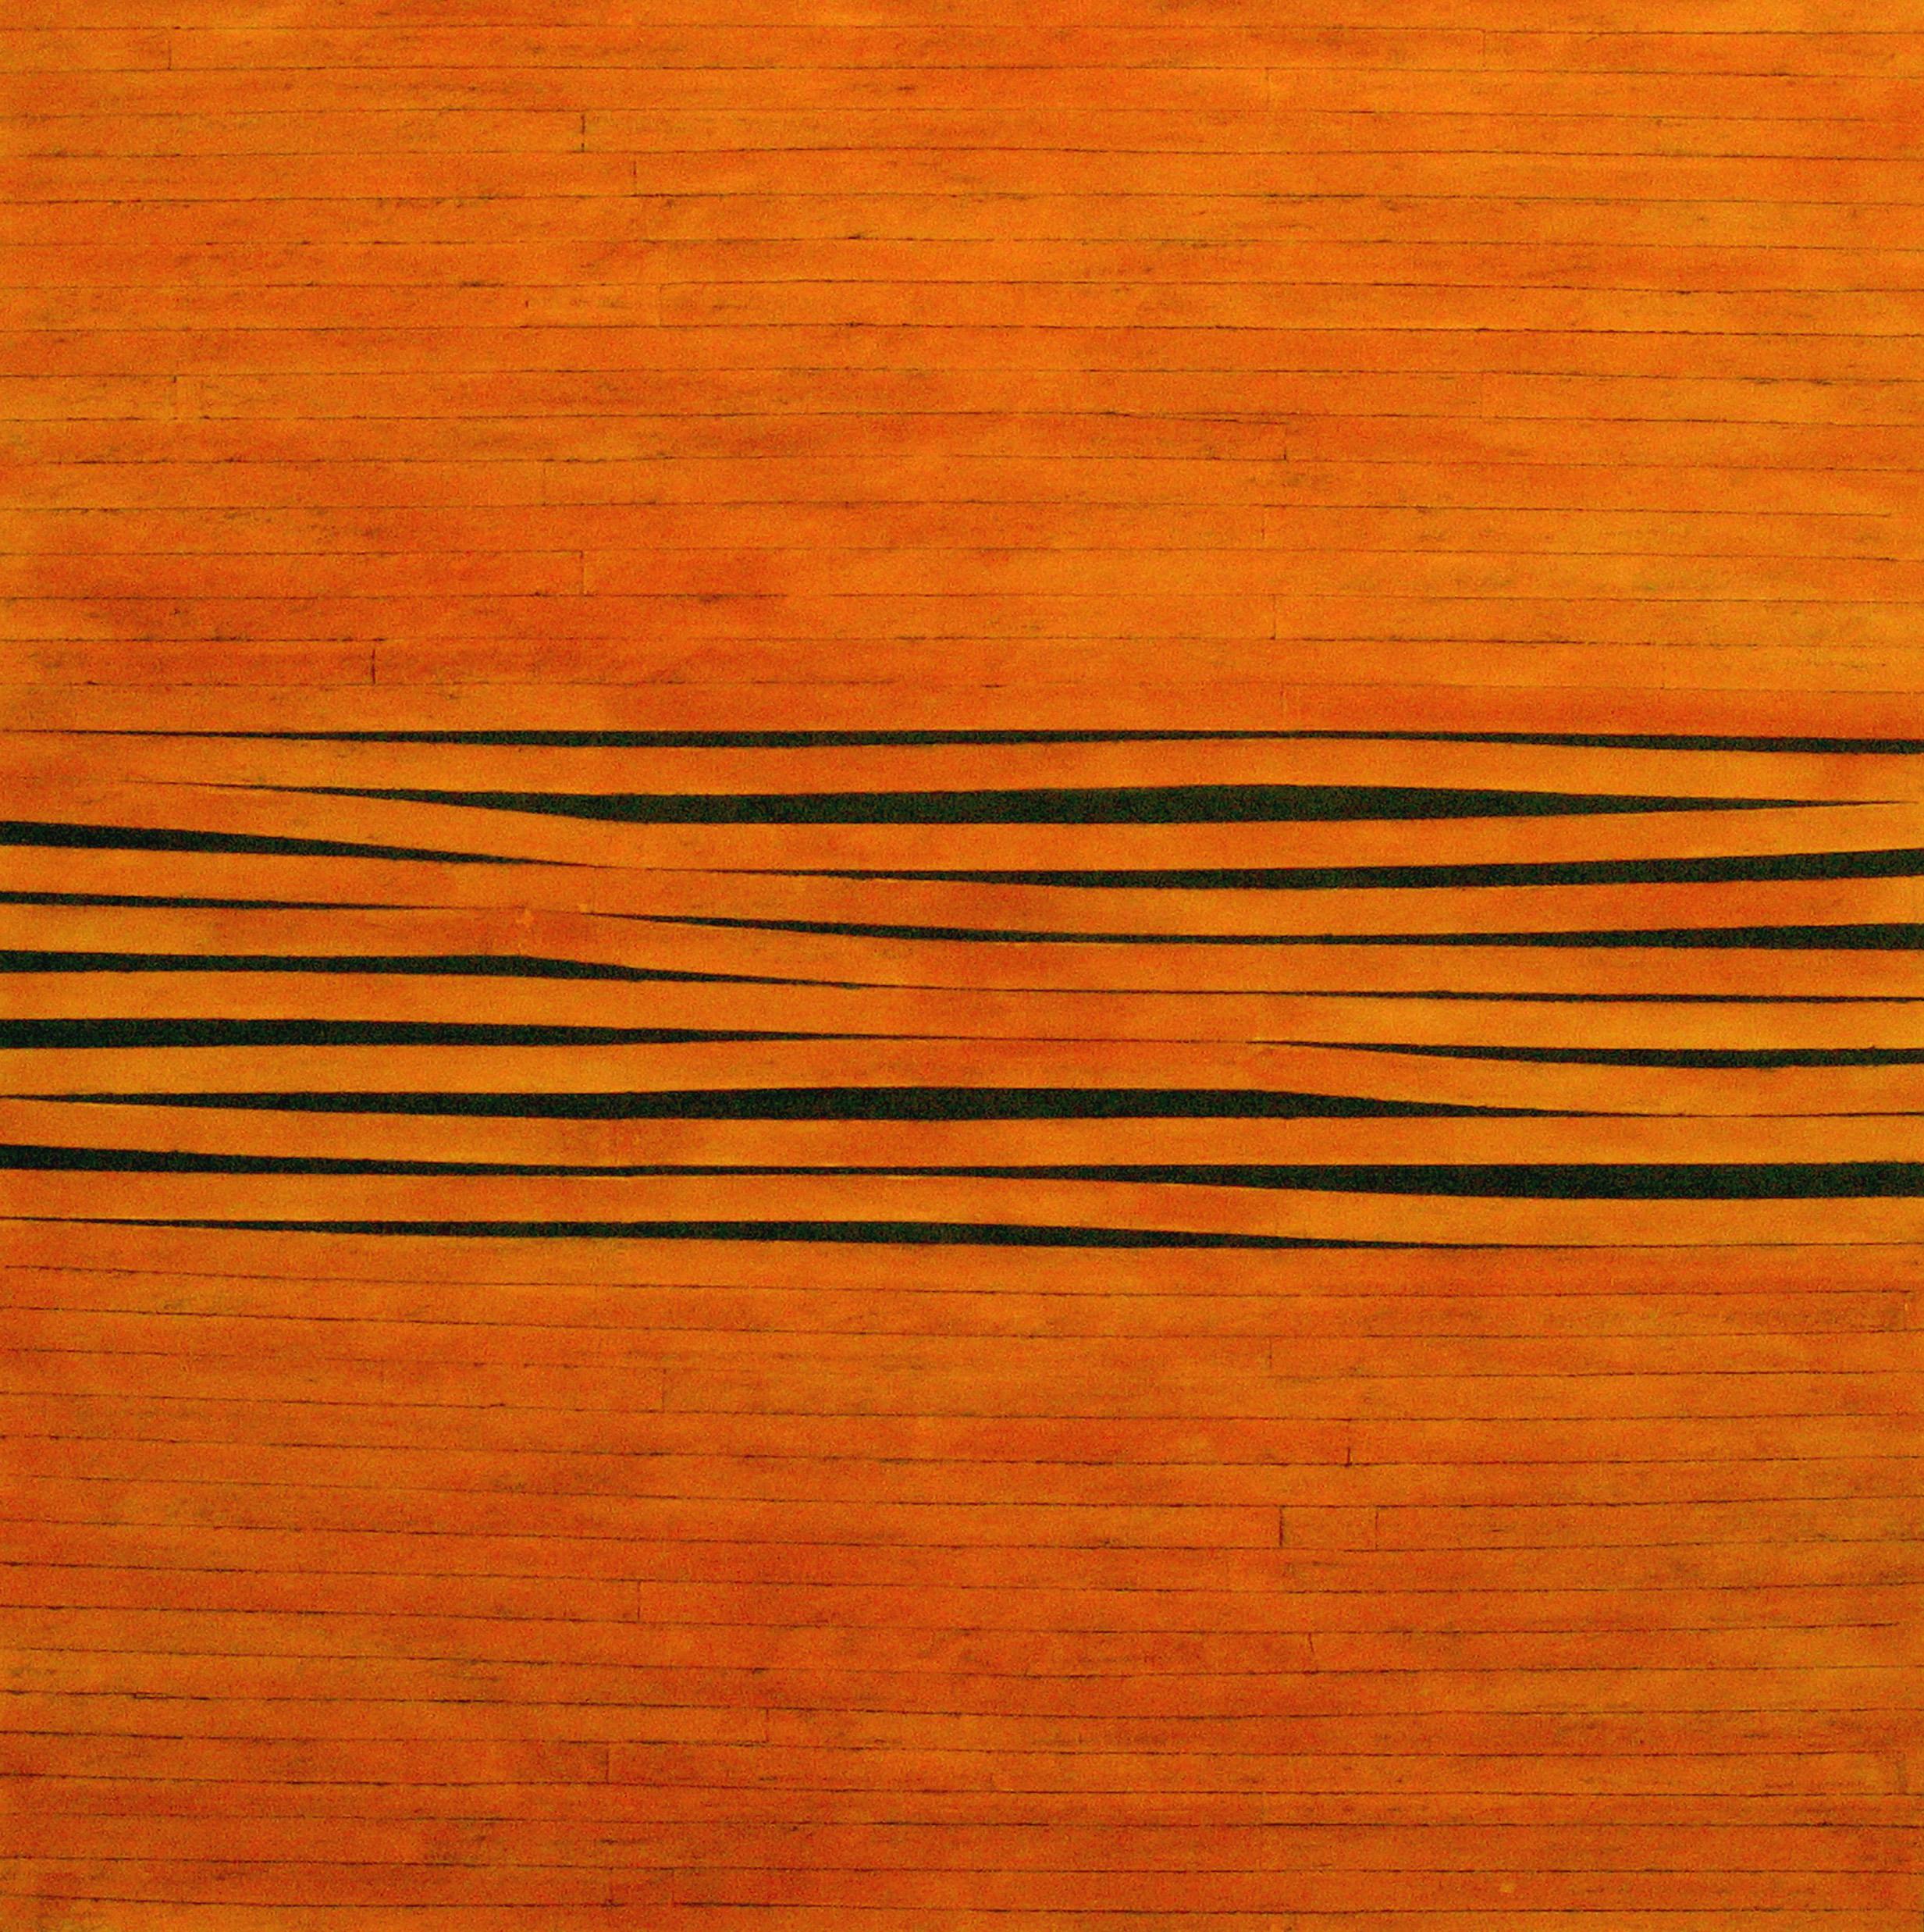 Sam Grigorian, Untitled , 2006, mixed media, decollage, 150 x 150 cm